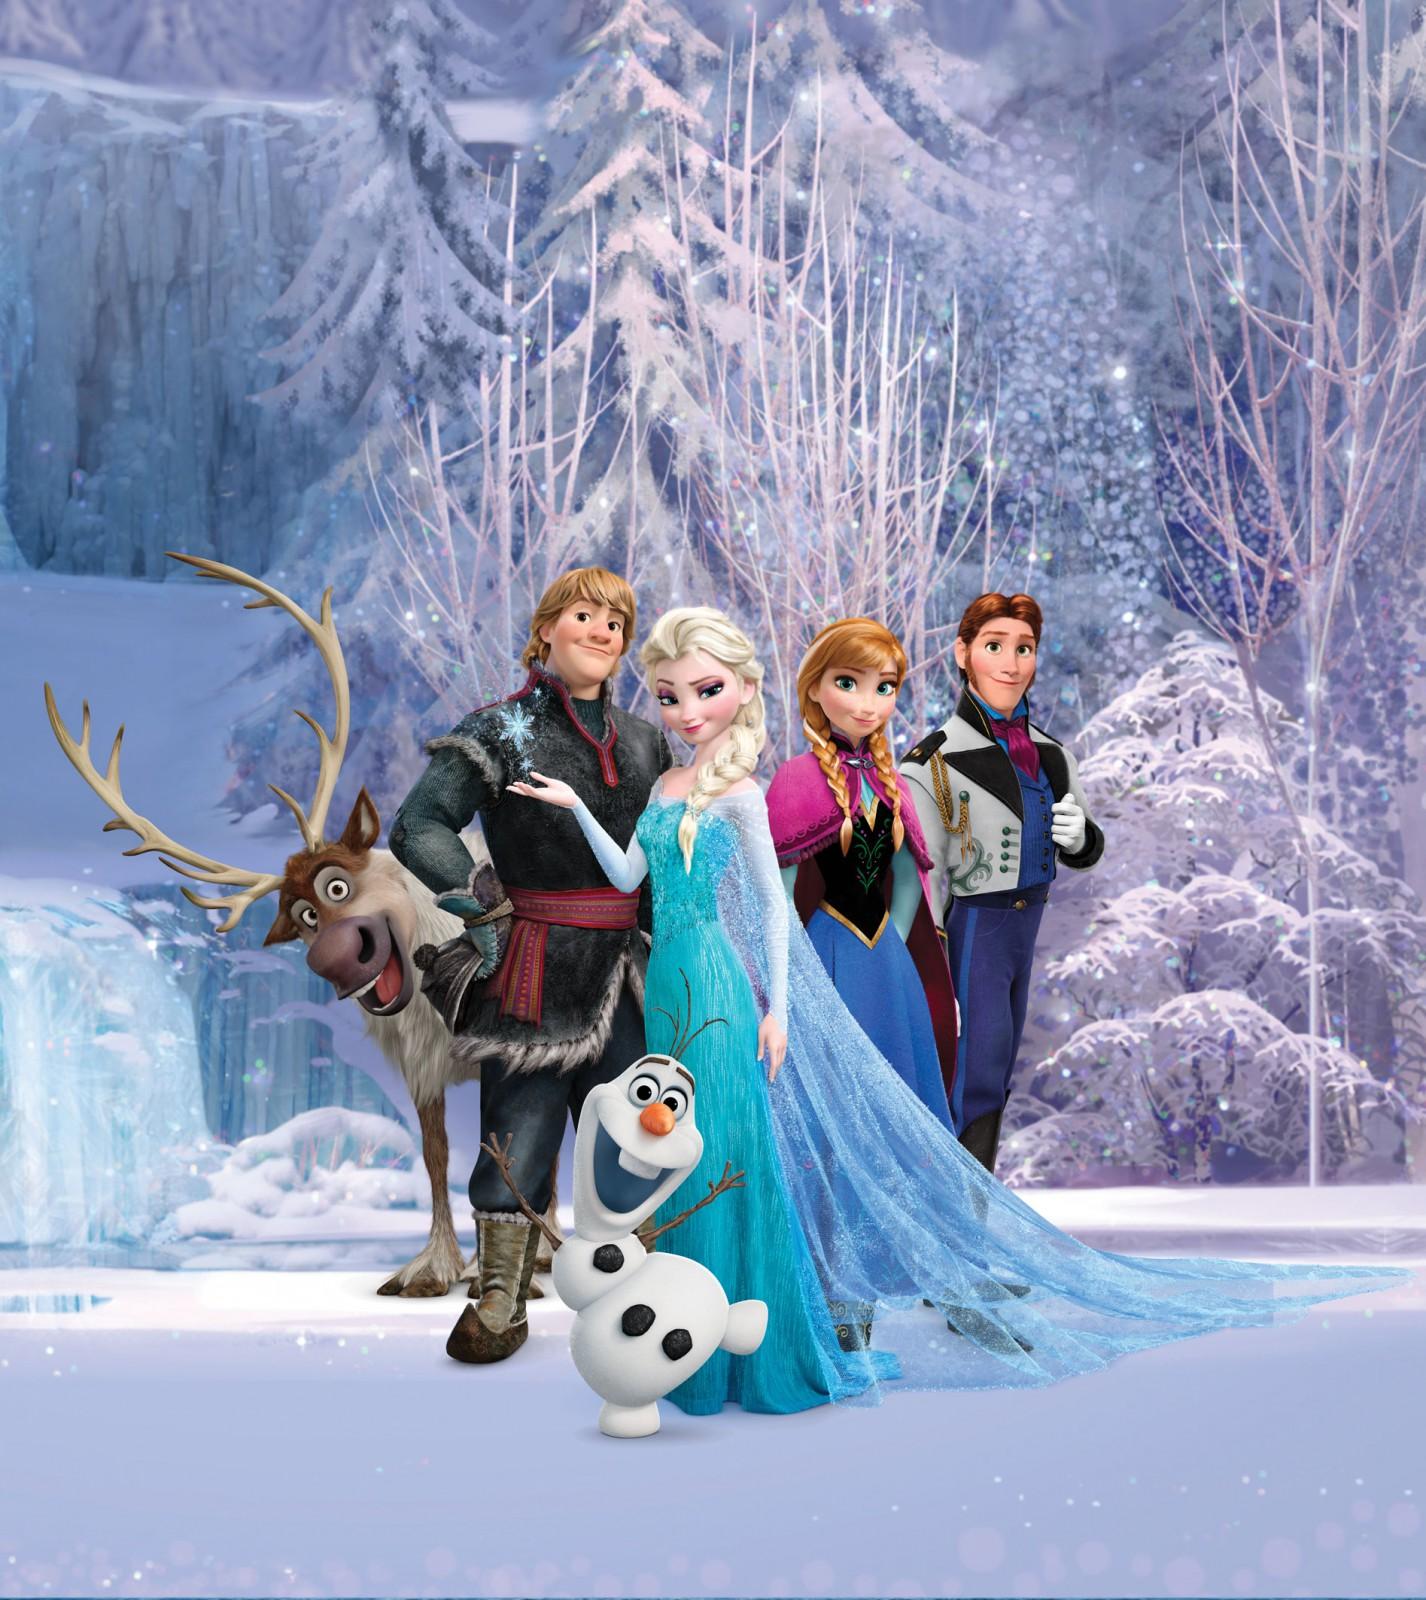 Disney XL Photo Wallpaper Mural Frozen Elsa Olaf 001